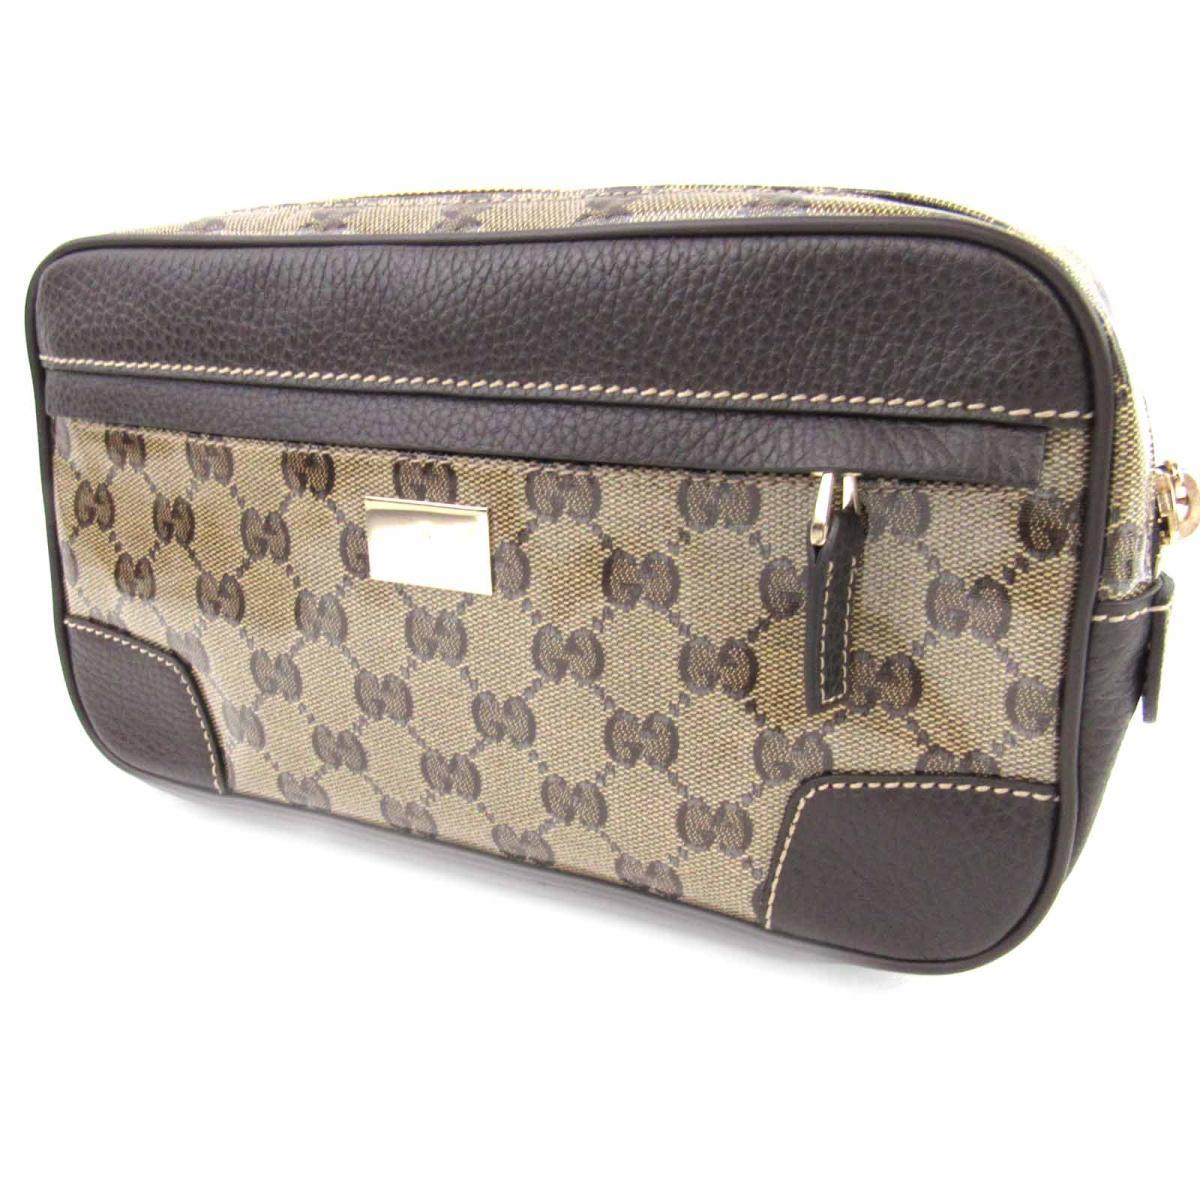 0554ea32 Gucci GG crystal waist porch body bag bag men gap Dis coating canvas (PVC)  x leather brown (336672)   GUCCI BRANDOFF brand off-brand brand bag back ...